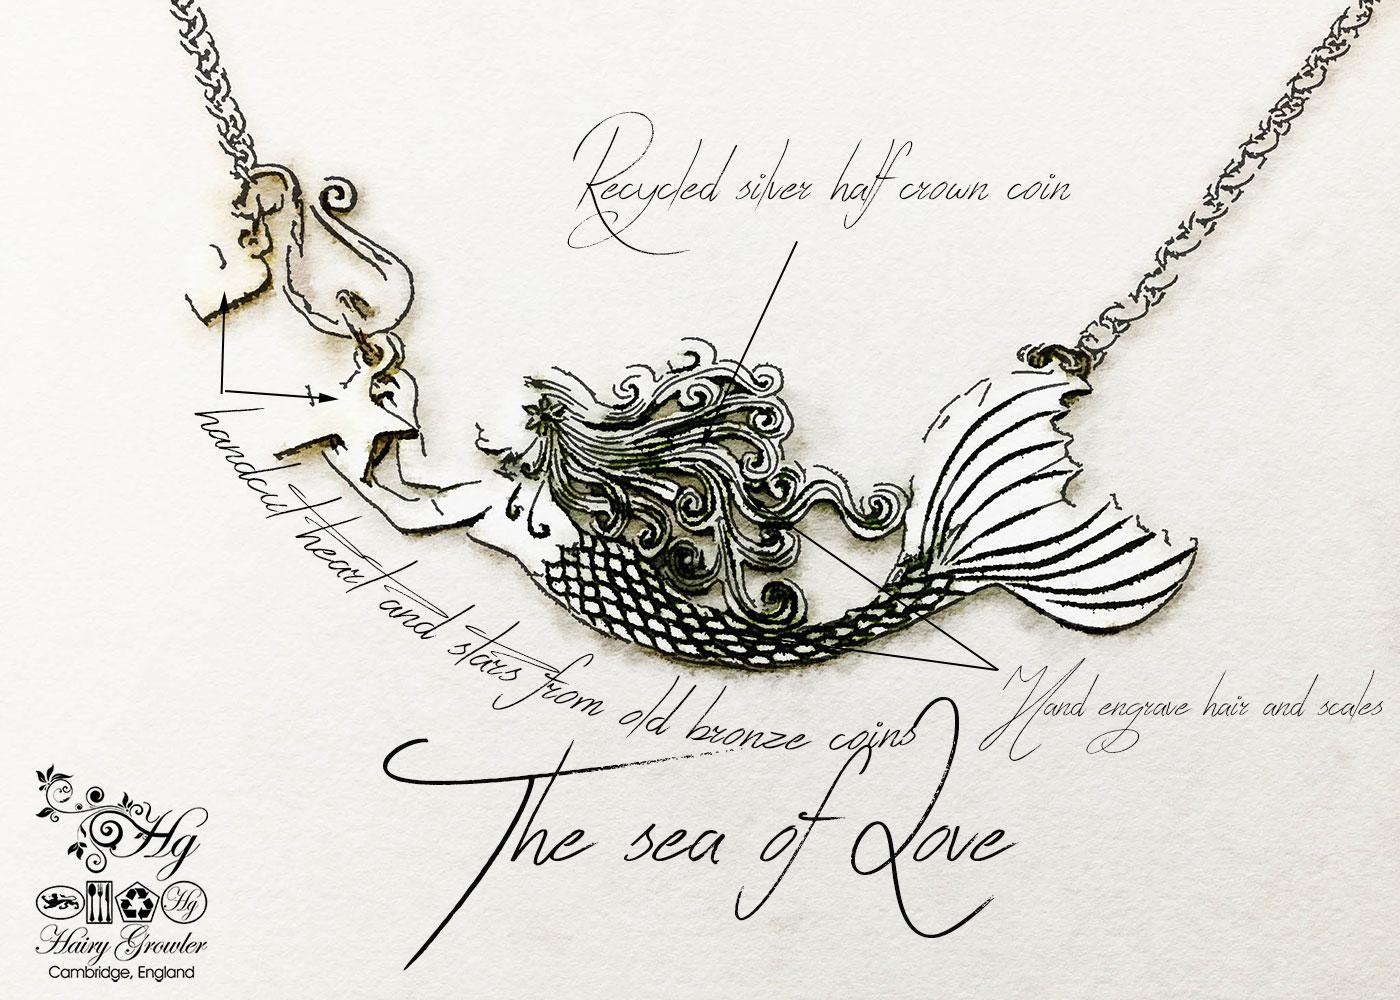 Mermaid necklace made in landlocked Cambridge, UK Hairy Growler workshop